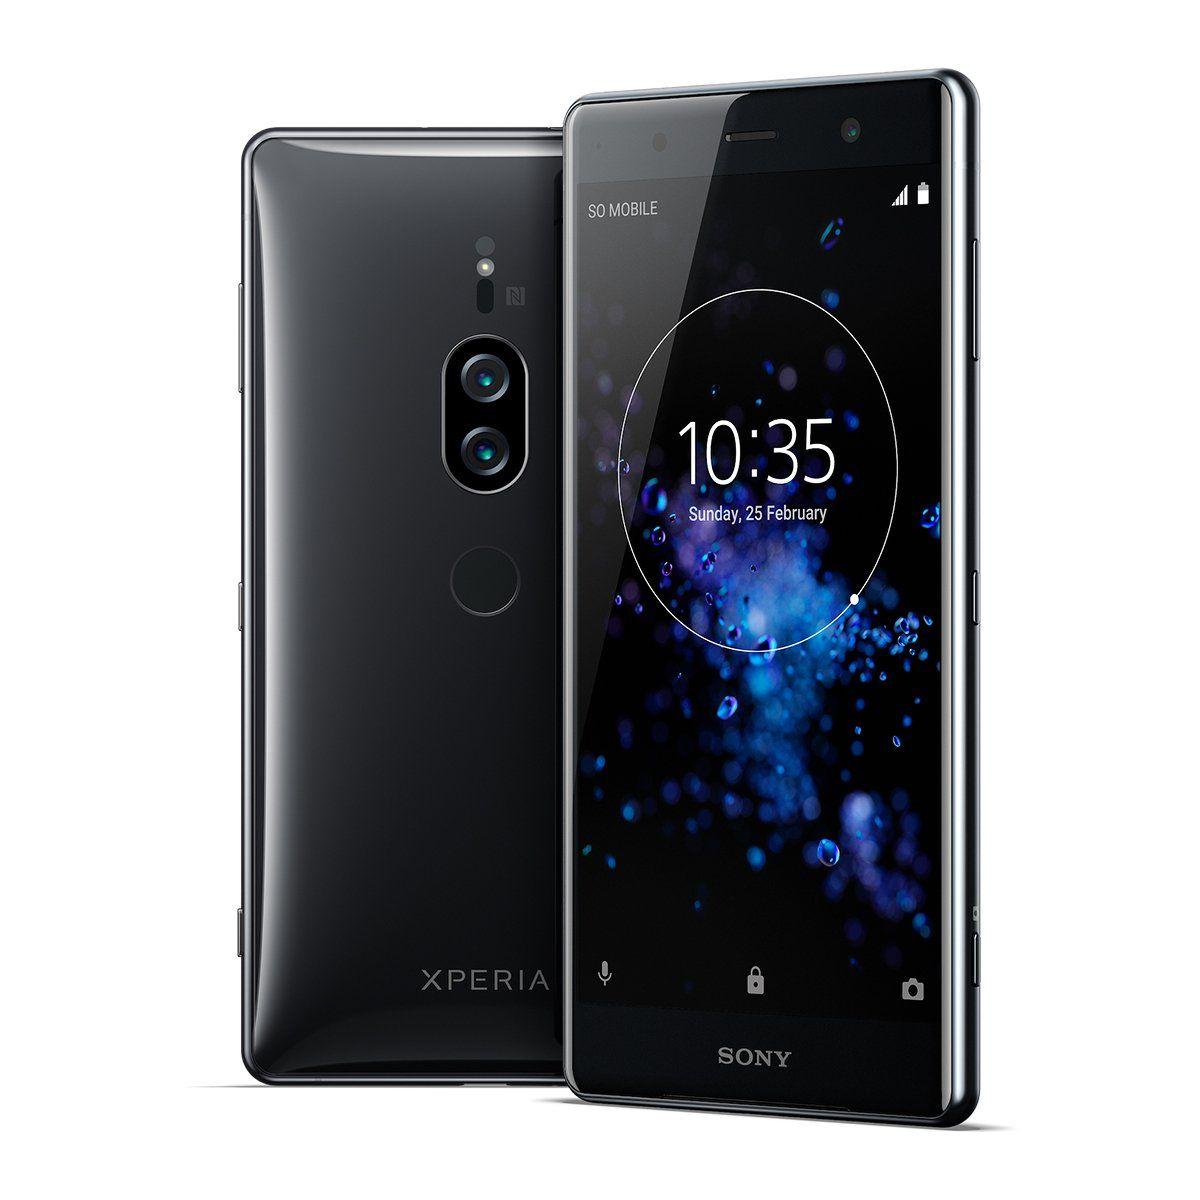 Sony Xperia Xz2 Premium Unlocked Smarphone Dual Sim 5 8 4k Hdr Screen 64gb Chrome Black Us Warranty Sony Xperia Latest Camera Dual Sim